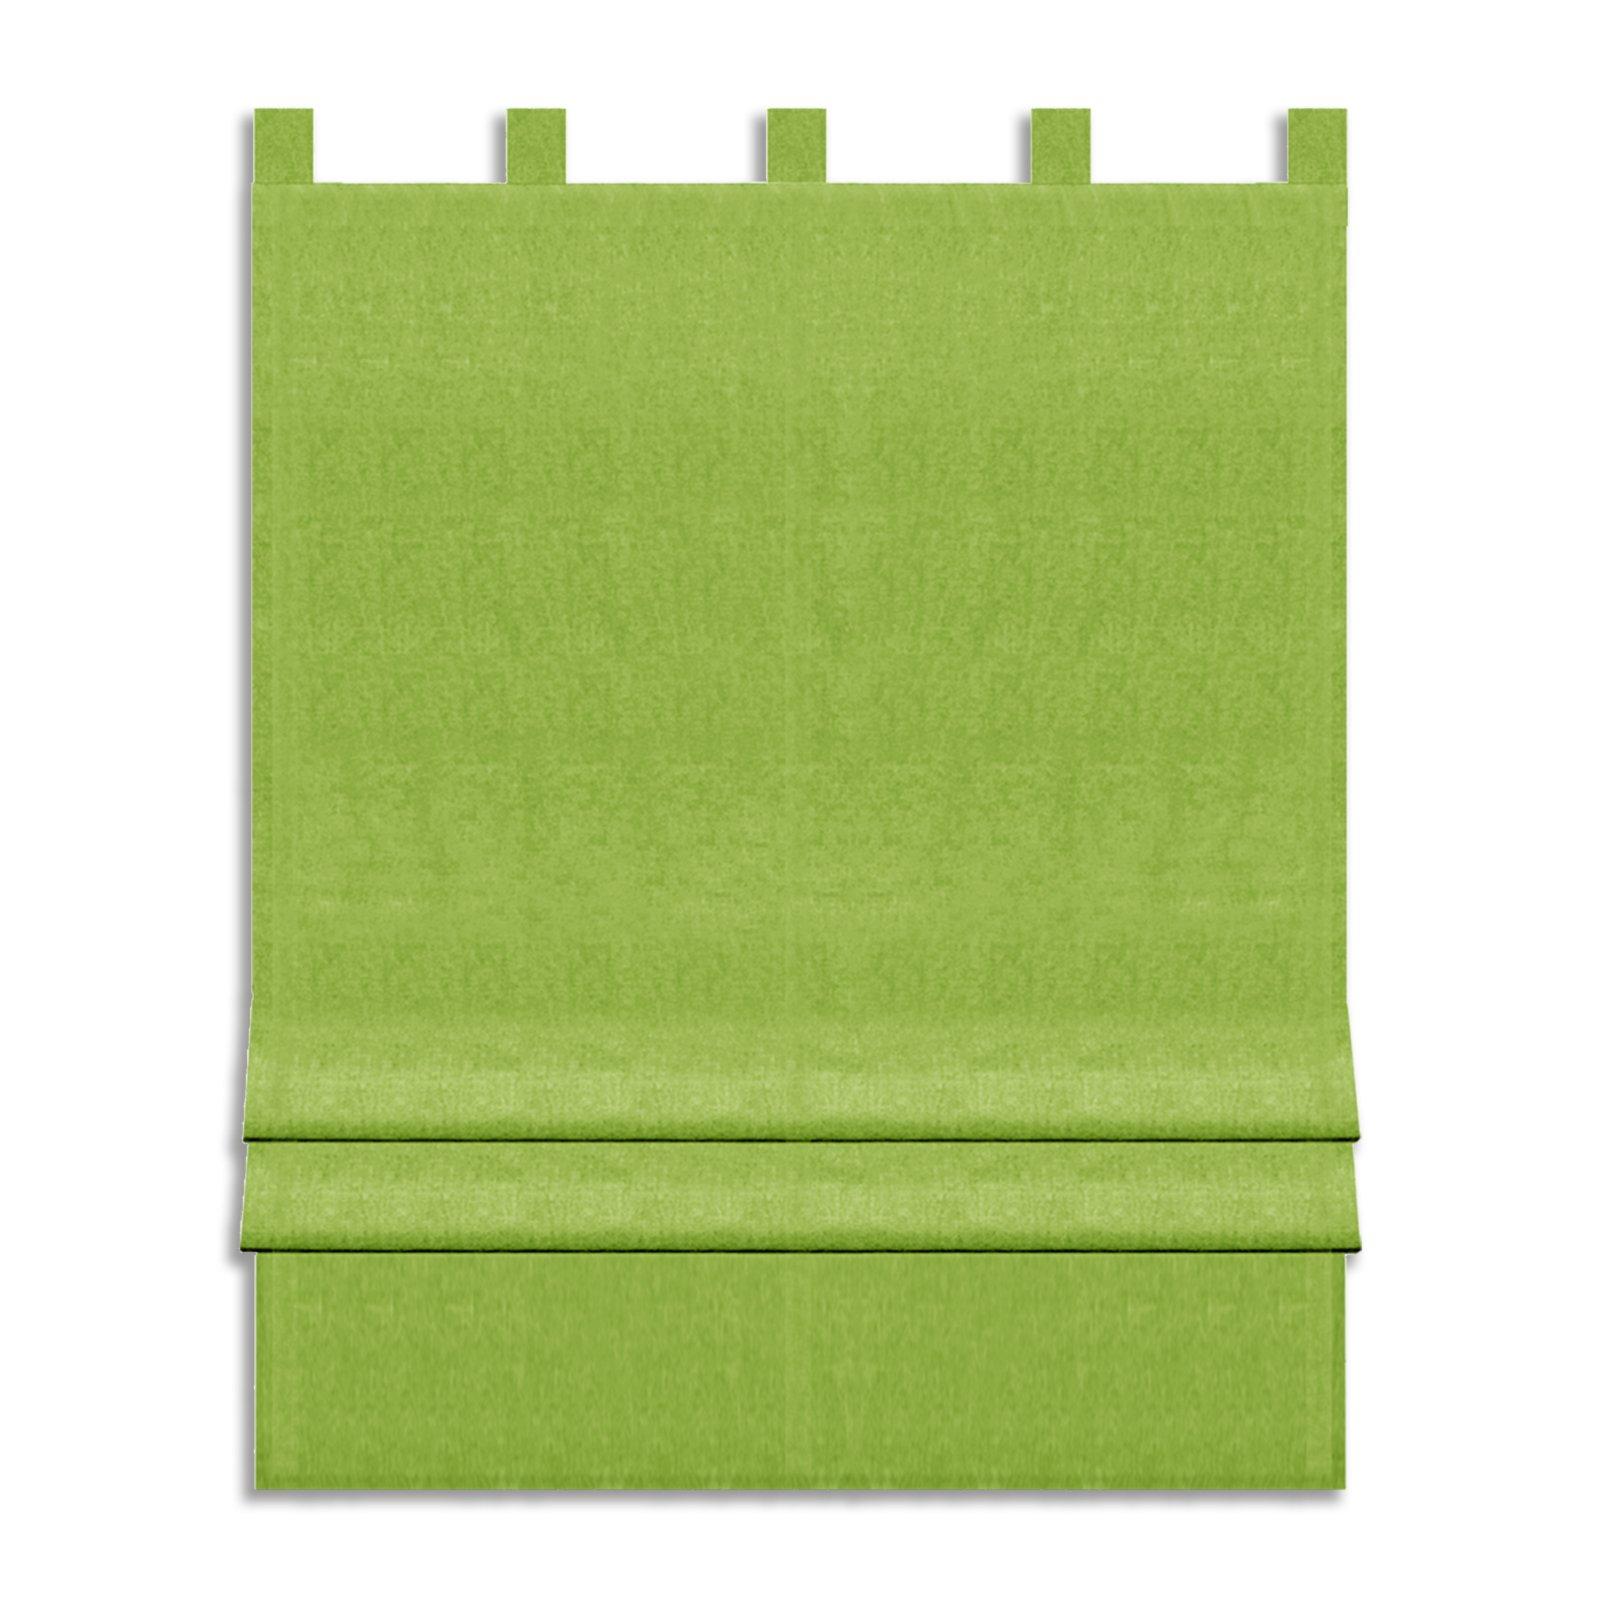 raffrollo pia gr n melange 60x140 cm raffrollos. Black Bedroom Furniture Sets. Home Design Ideas